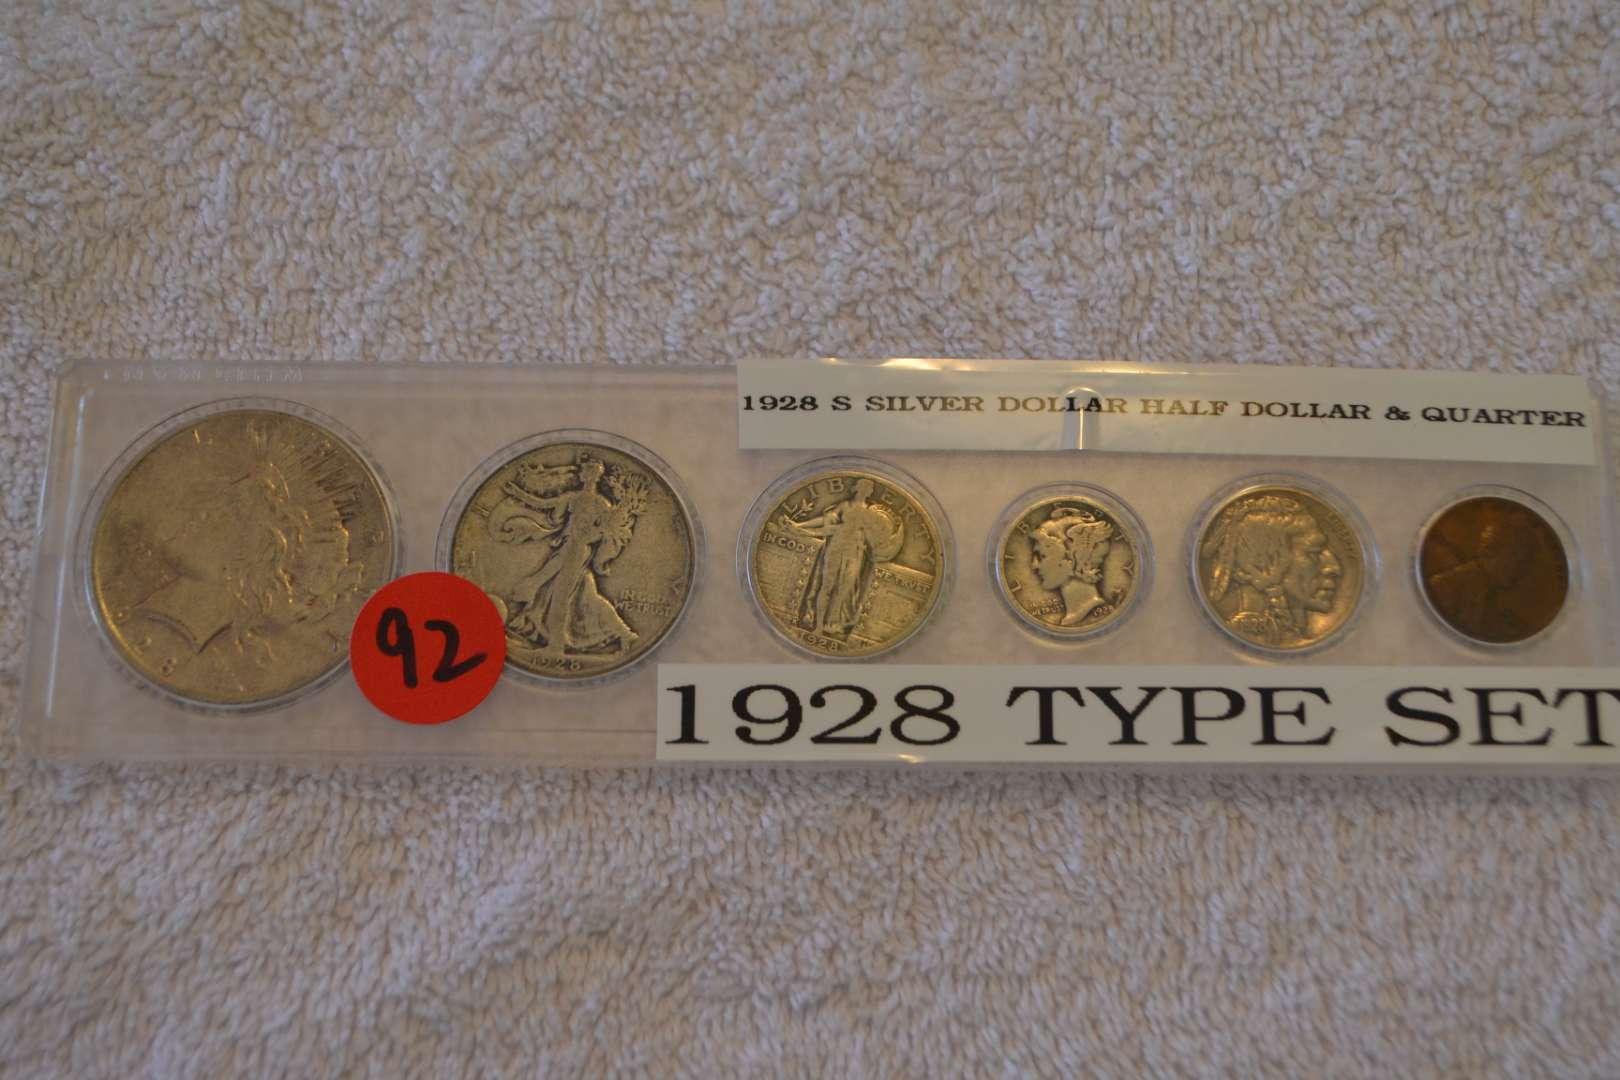 Lot # 92 1928 S SILVER DOLLAR, HALF DOLLAR & QUARTER TYPE SET